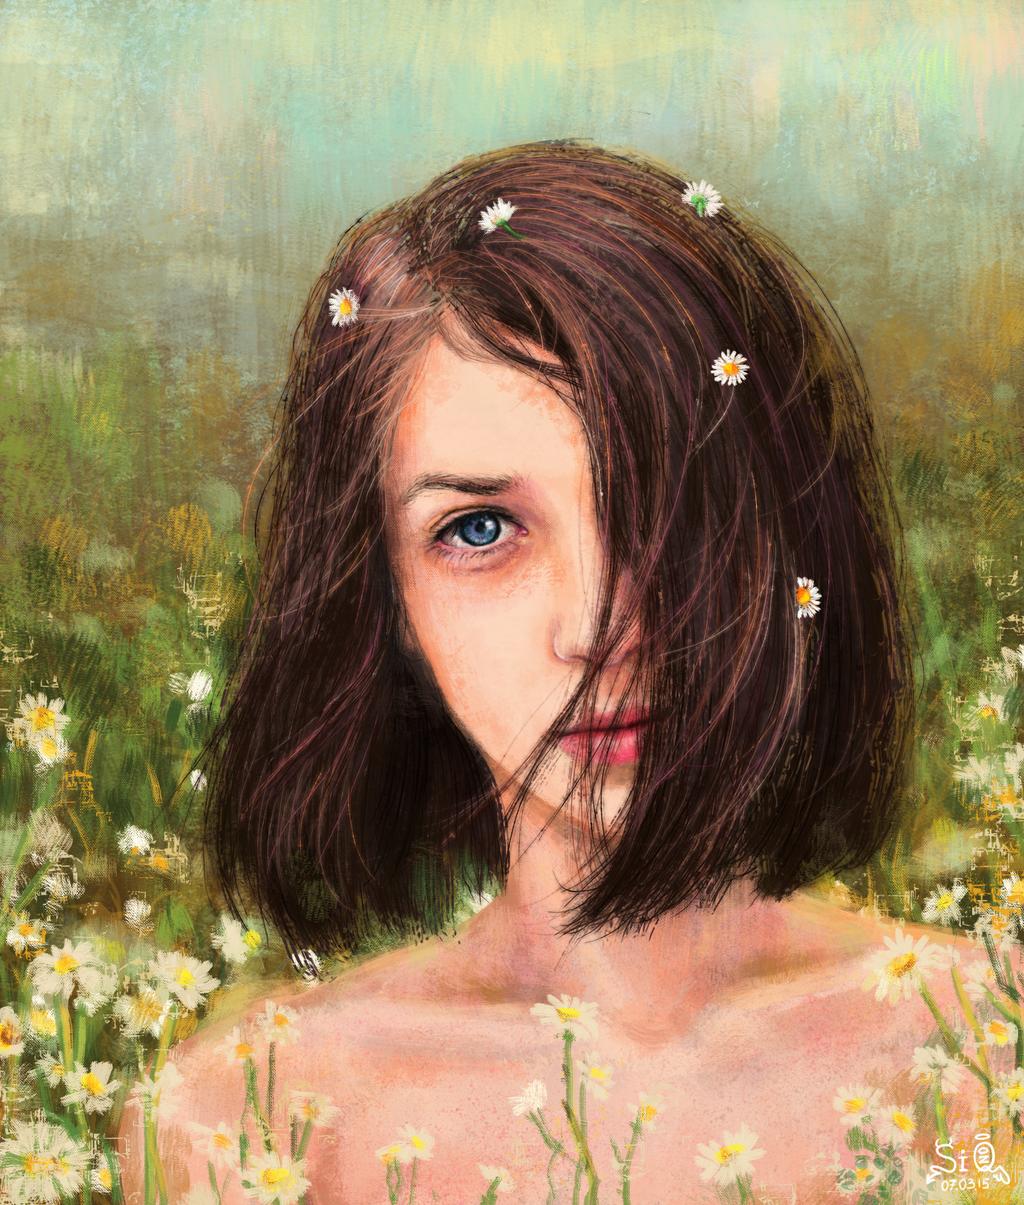 Girl In Flowers by Fuytski